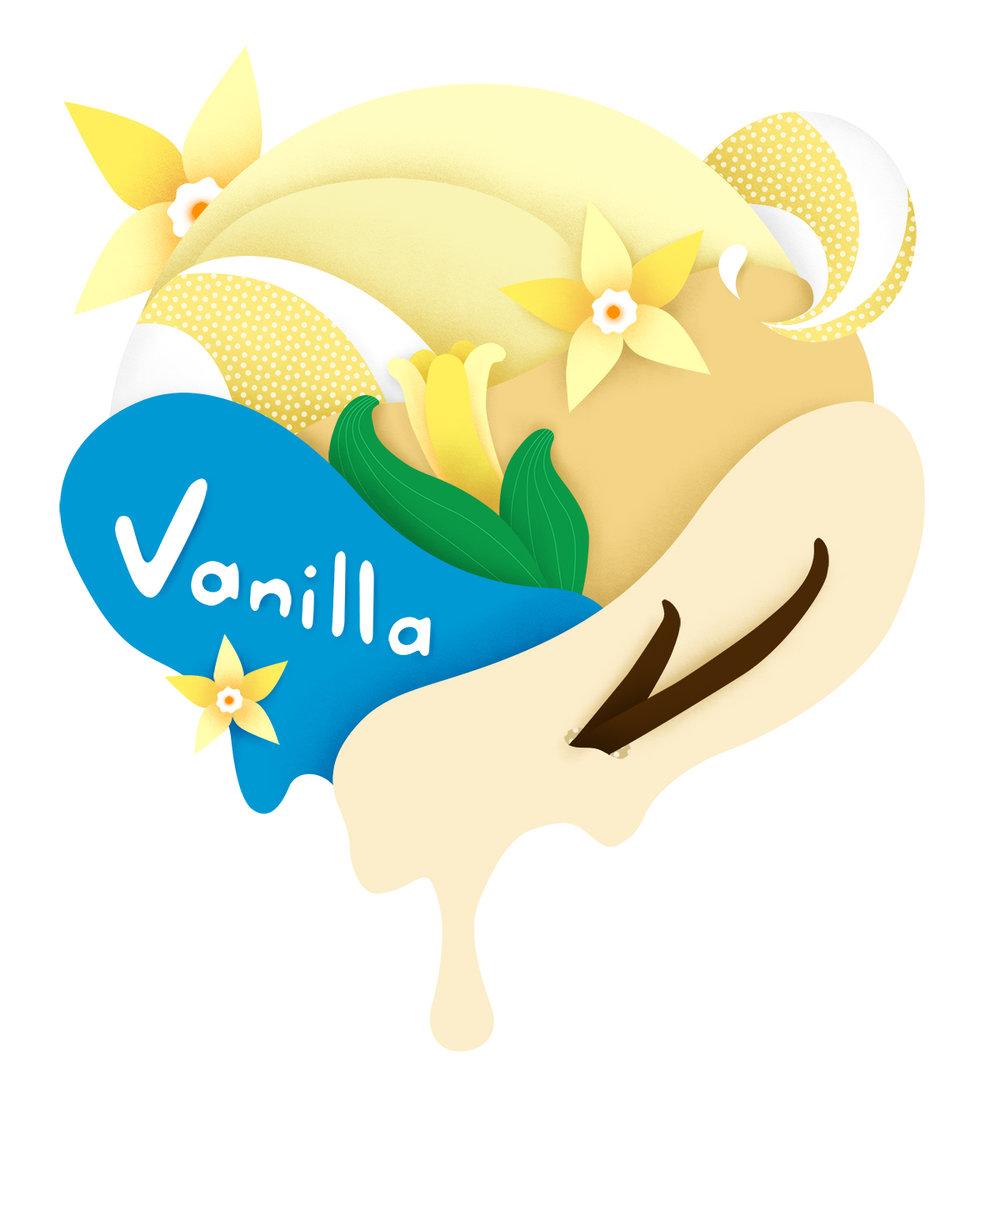 vanilla.1.3-02.jpg